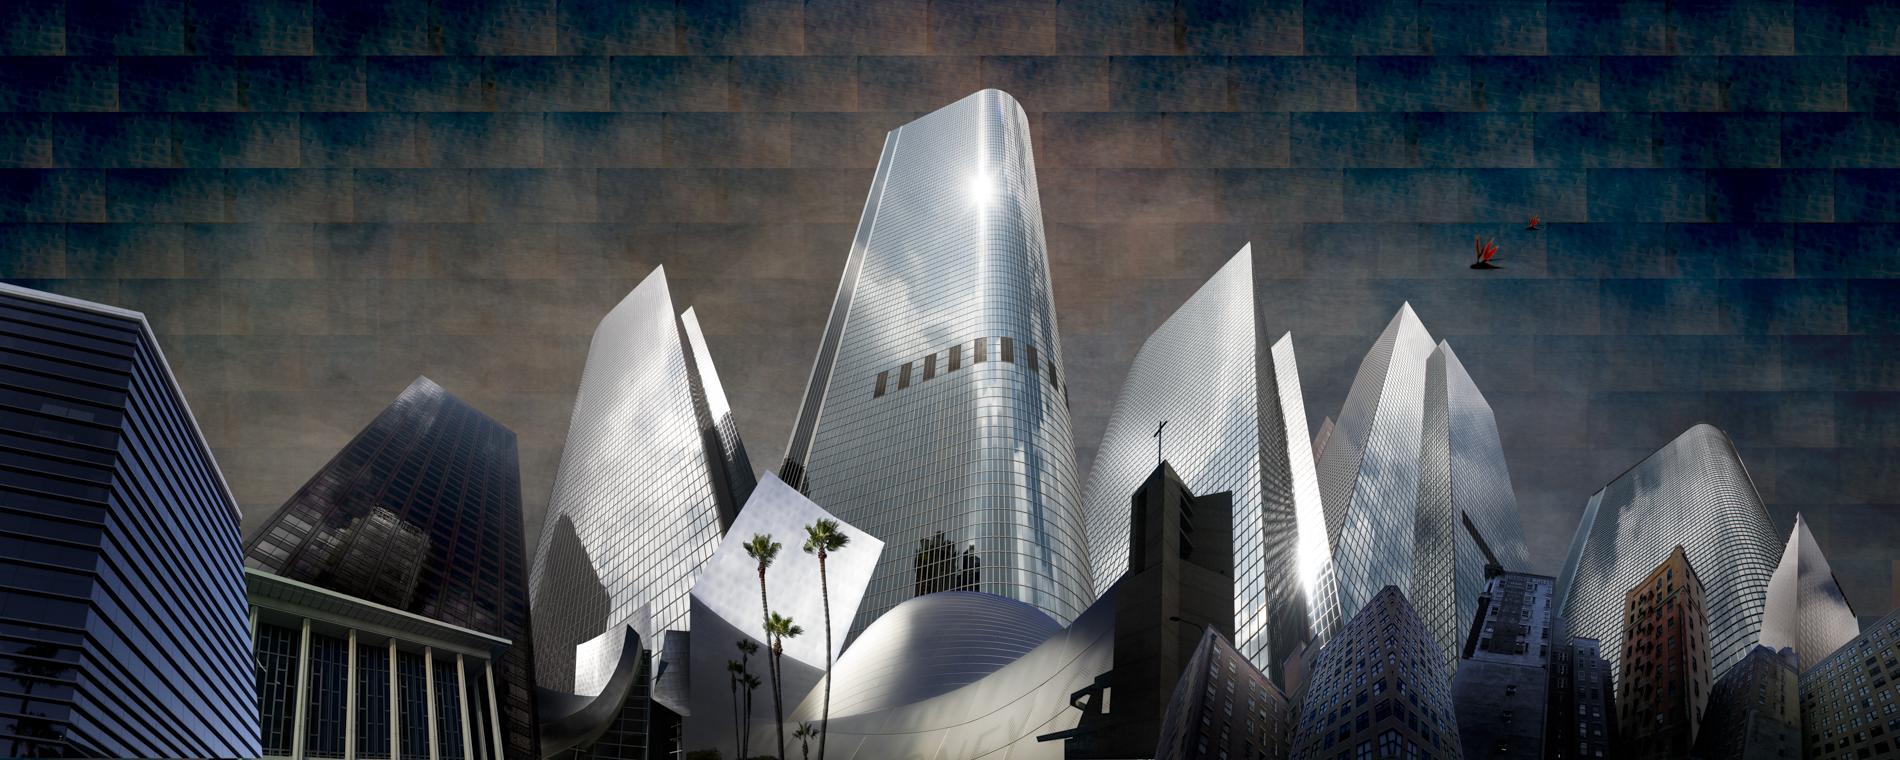 My LA City Skyline_Bruce Burr - 1900x72p